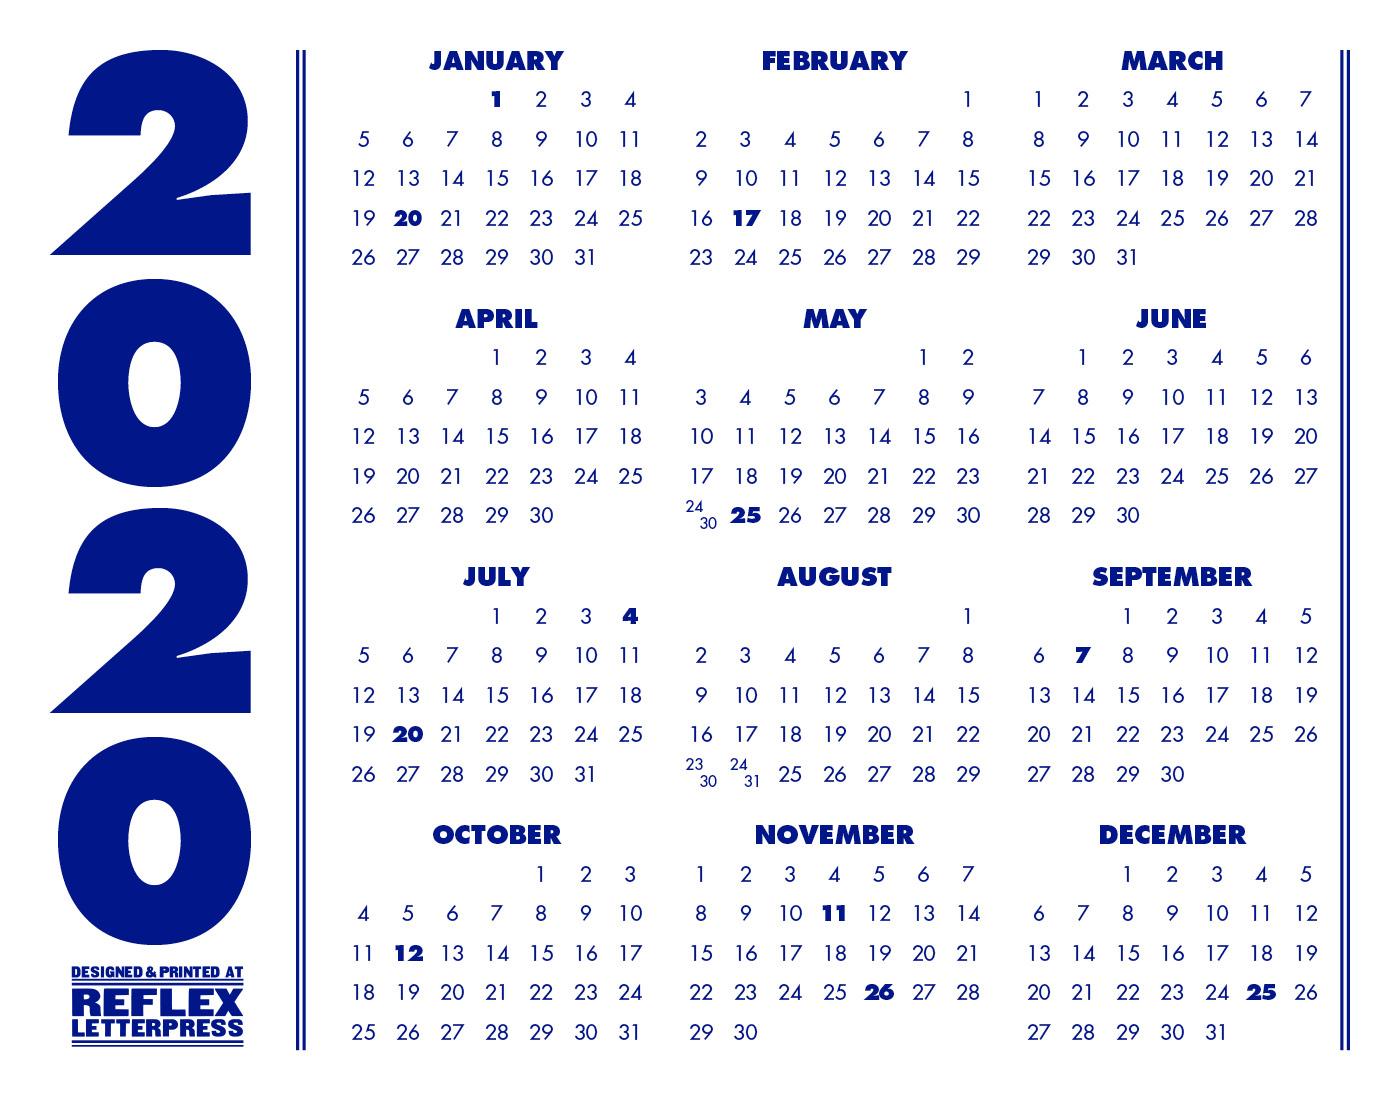 Rwu 2020 Calendar 2020 Minimalist Calendar – Reflex Letterpress